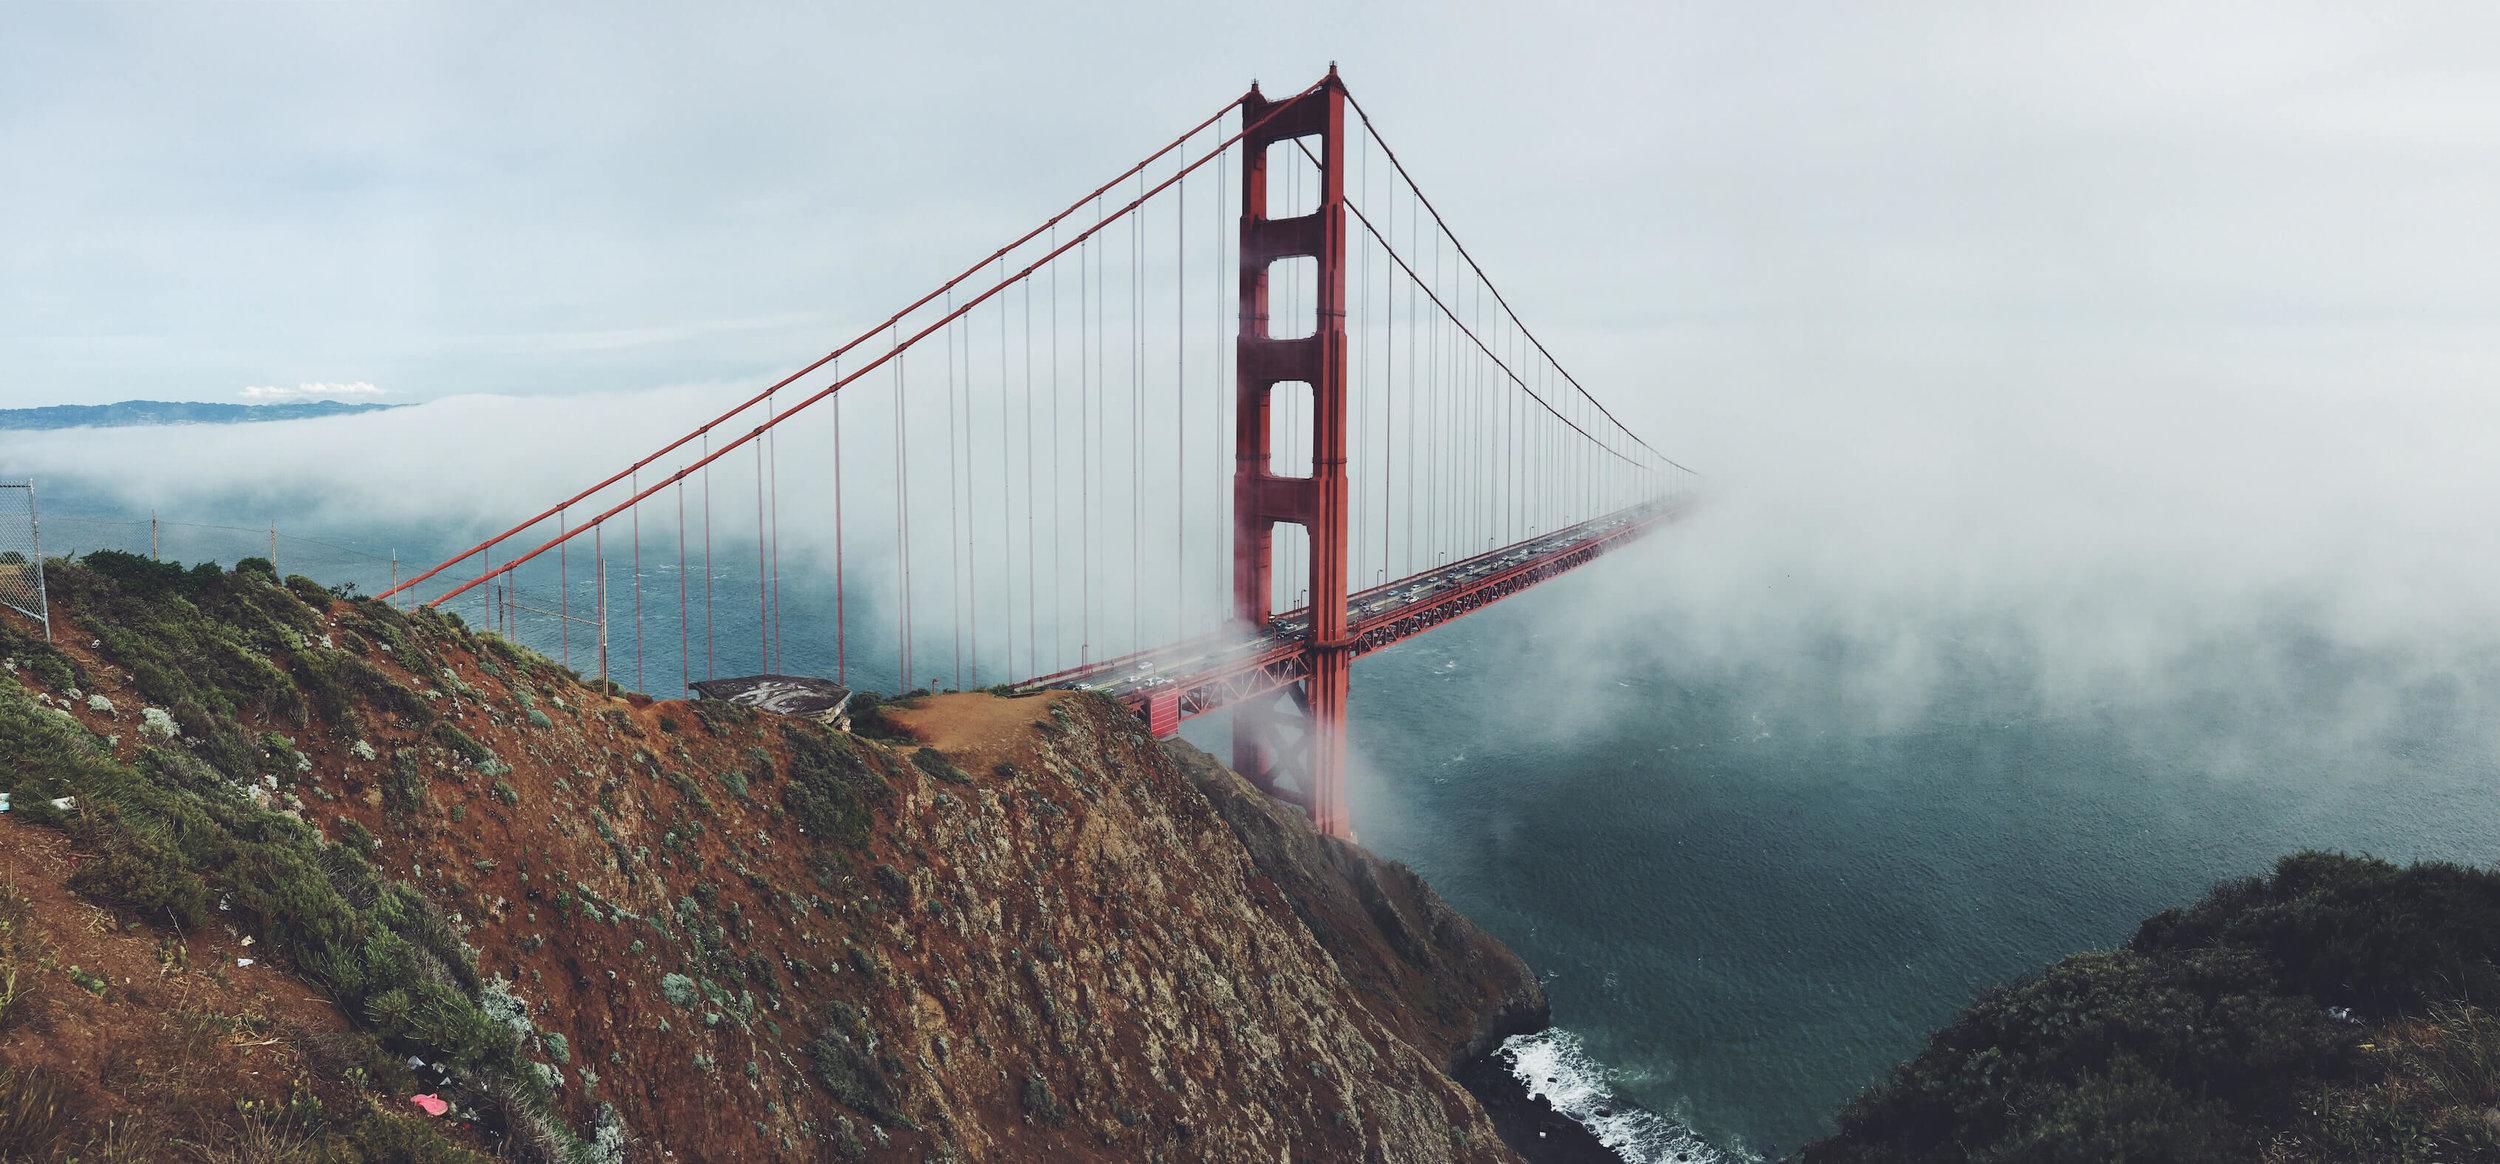 A short trip to San Francisco...